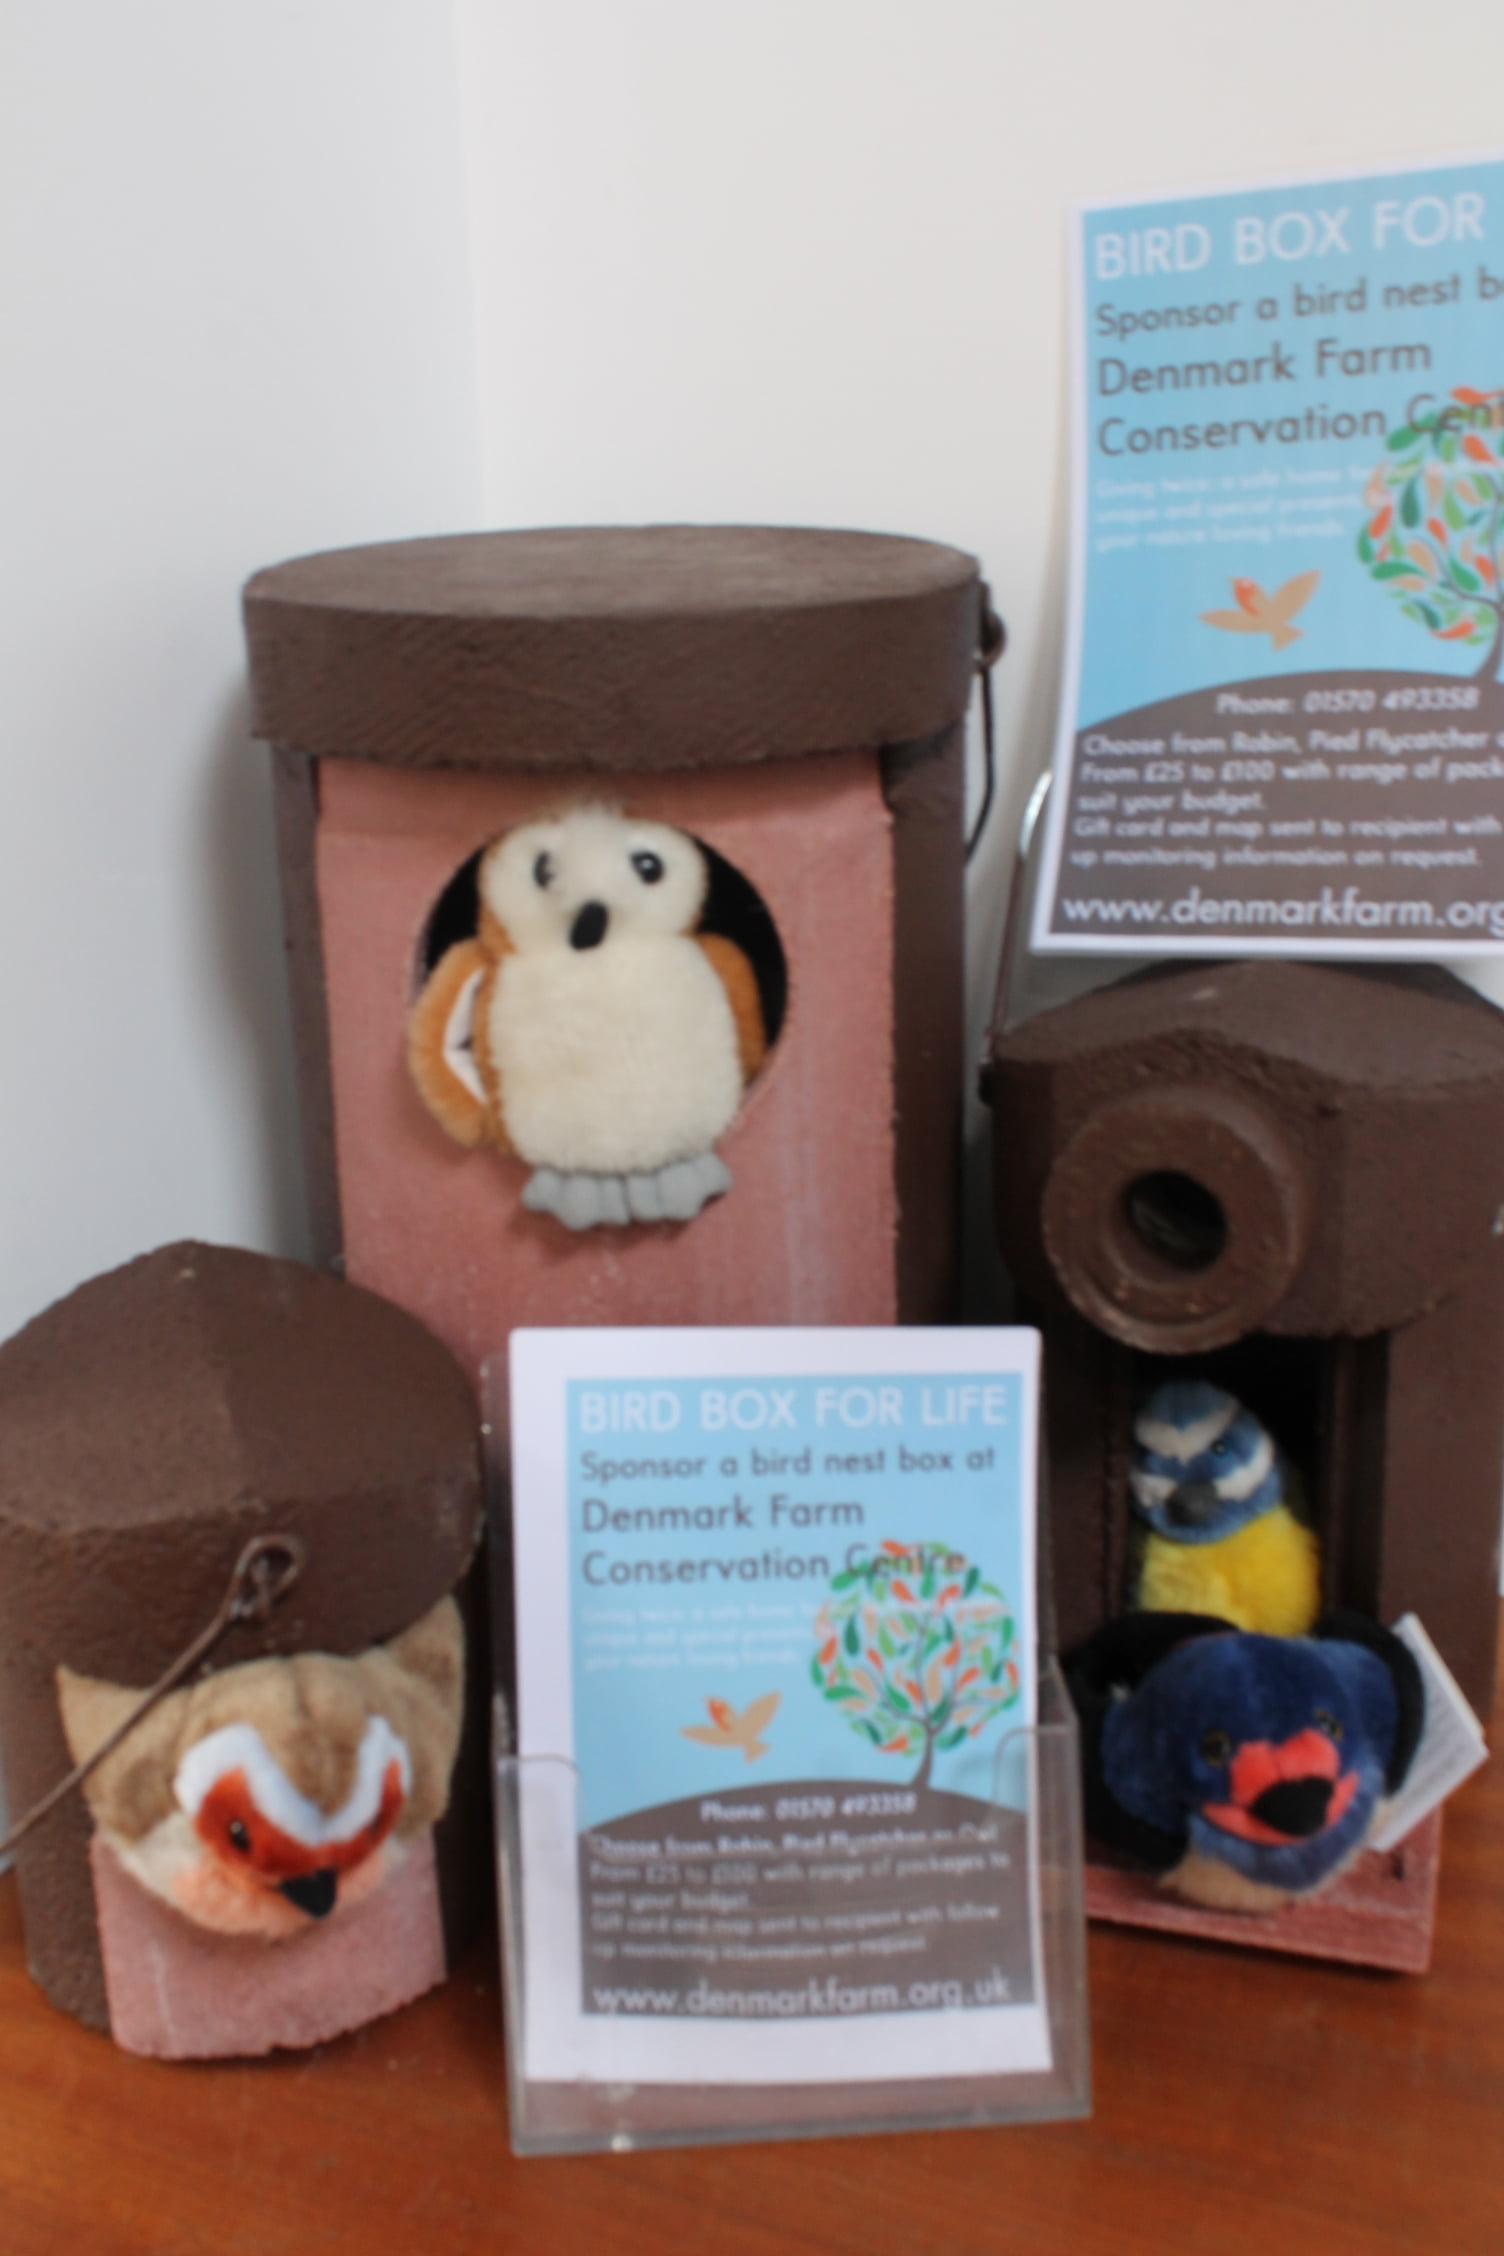 sponsor a nest box